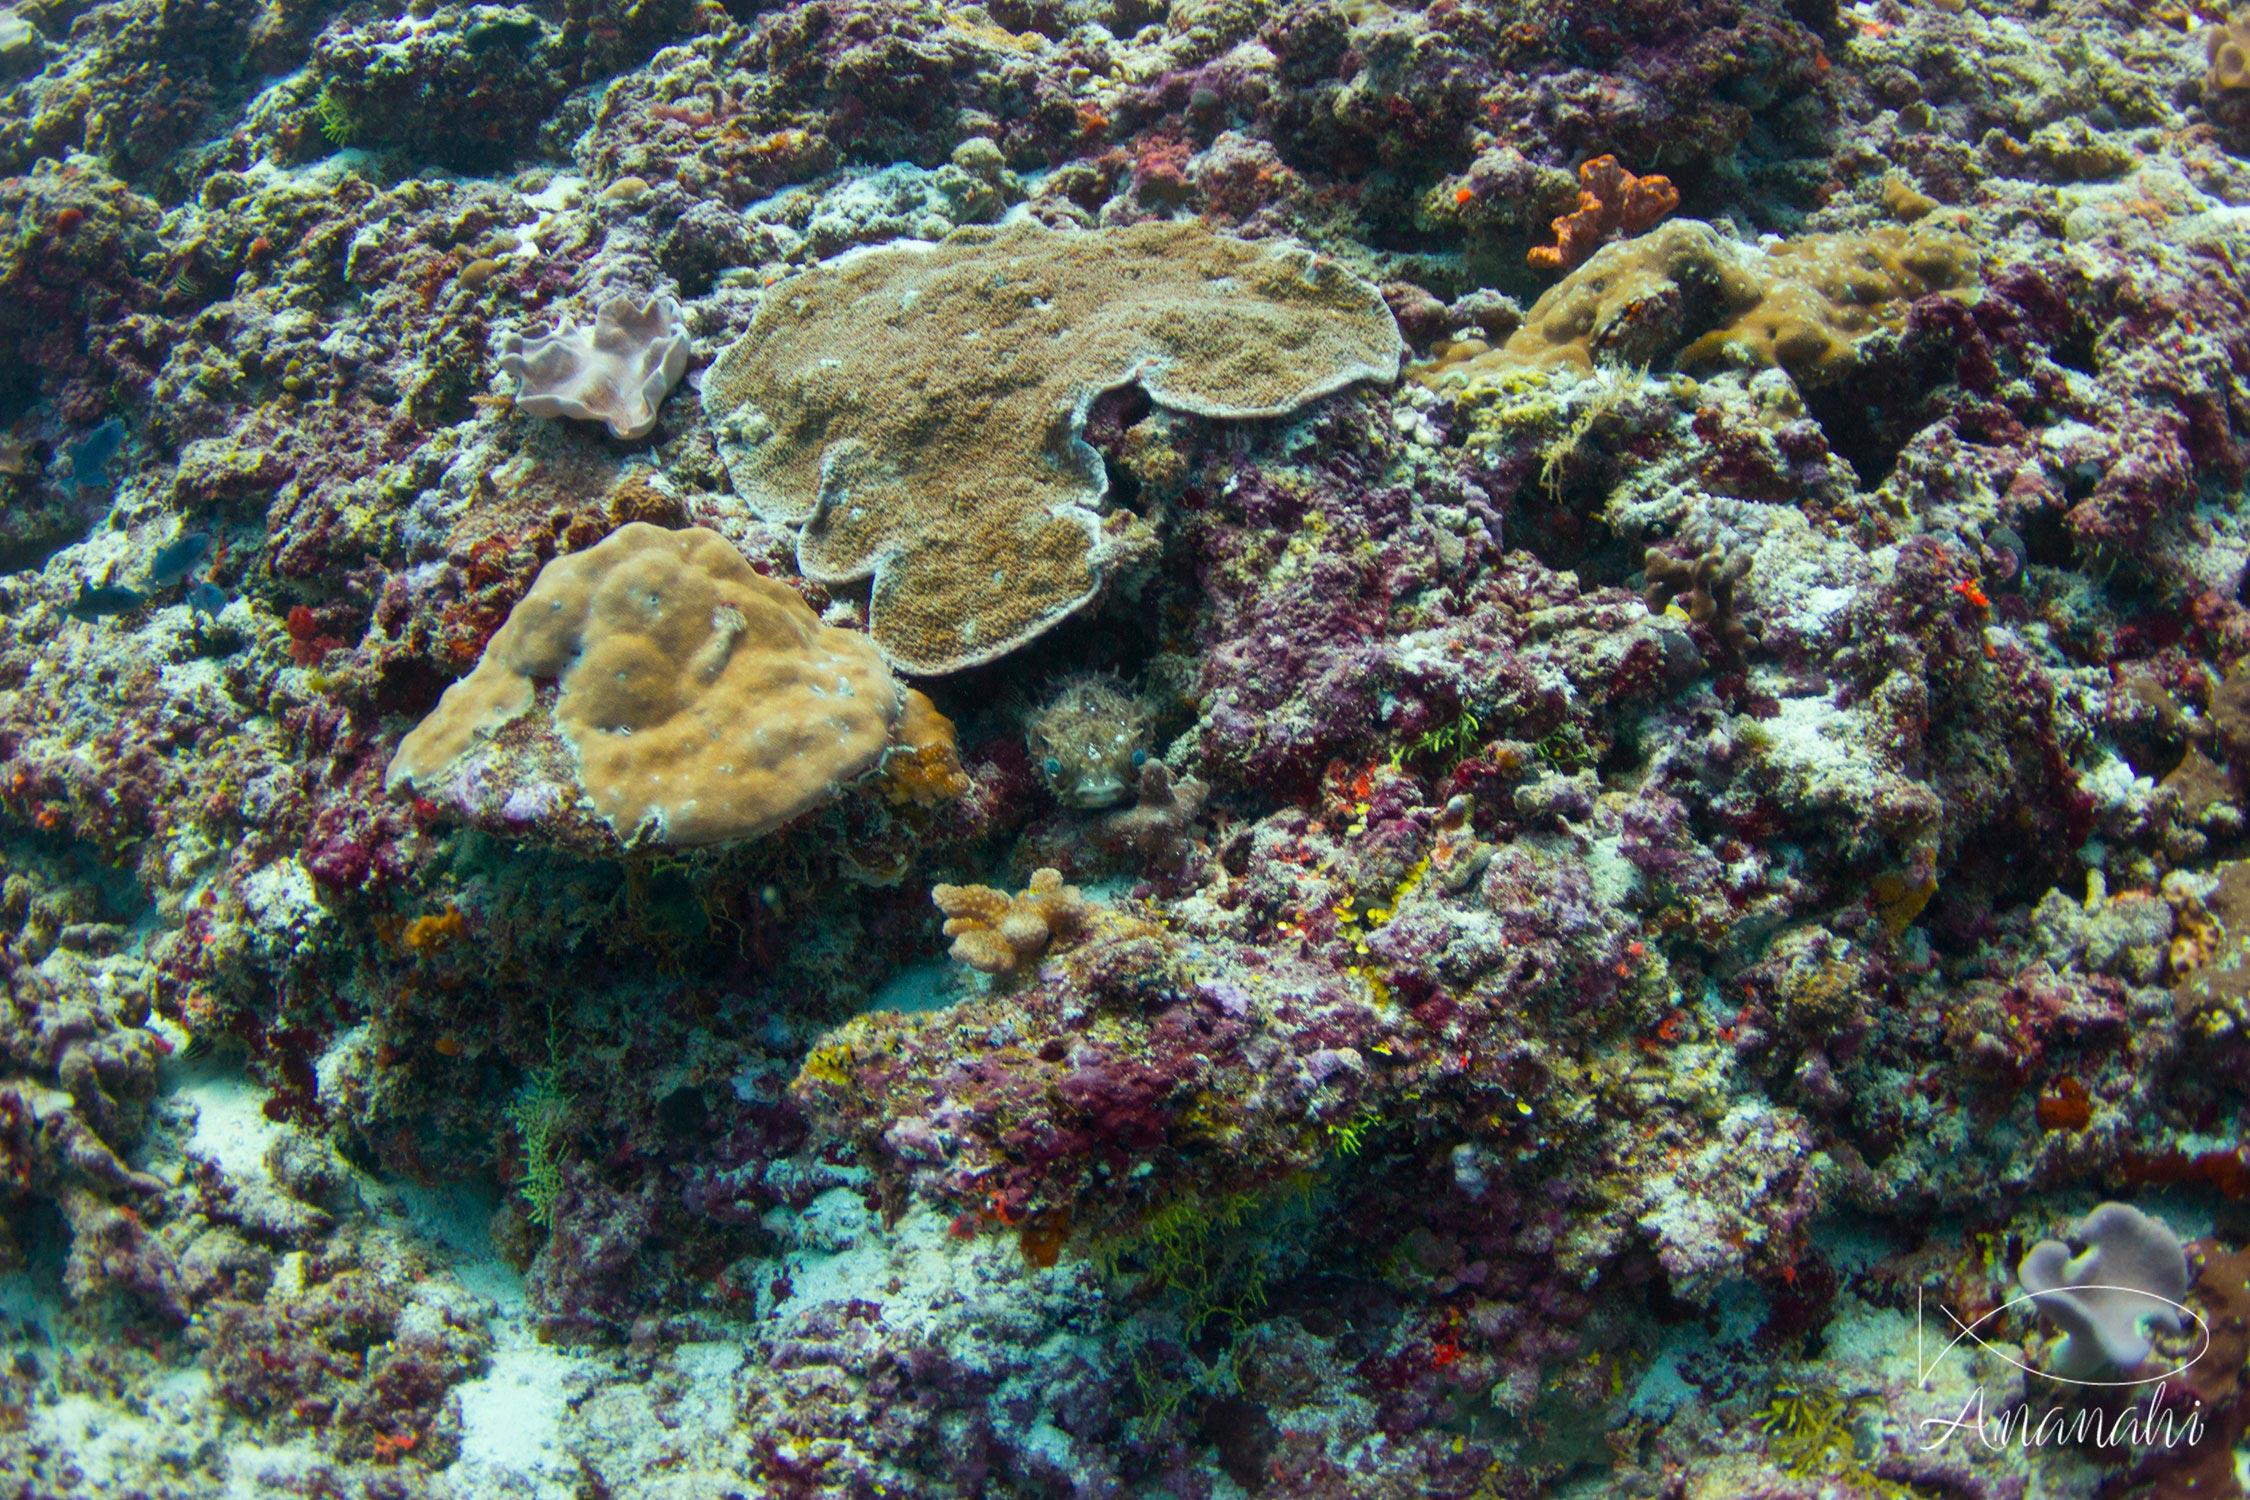 Brown porcupinefish of Maldives